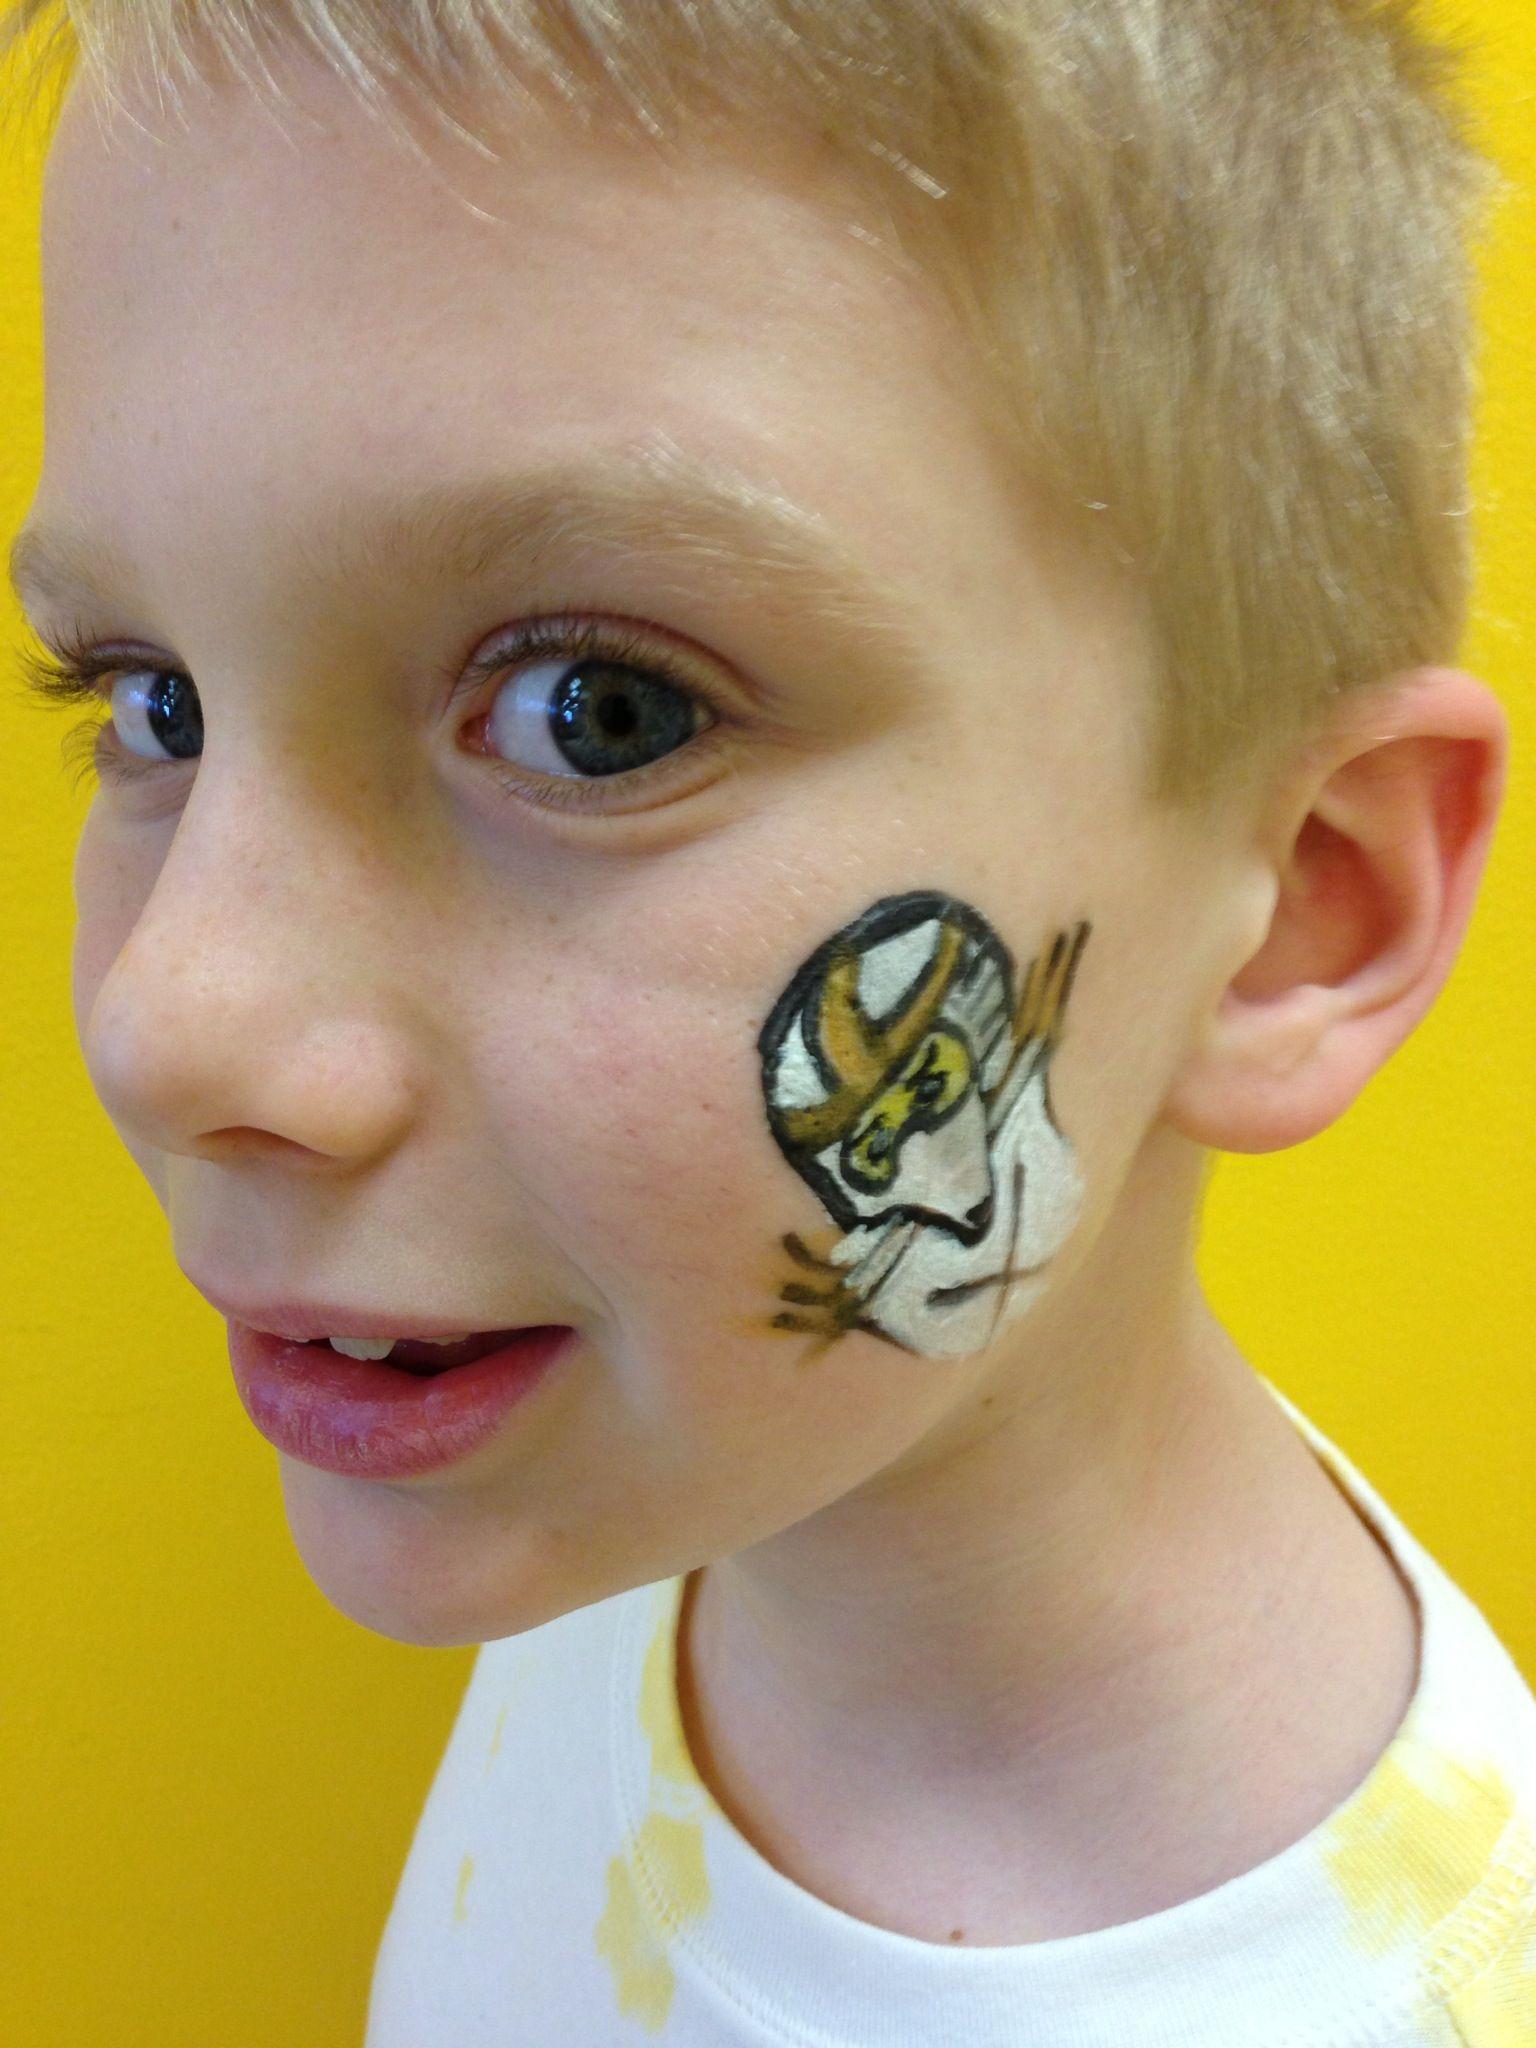 Ausmalbilder Ninjago Gesicht: Face Painting - Ninjago Zane, Ninja